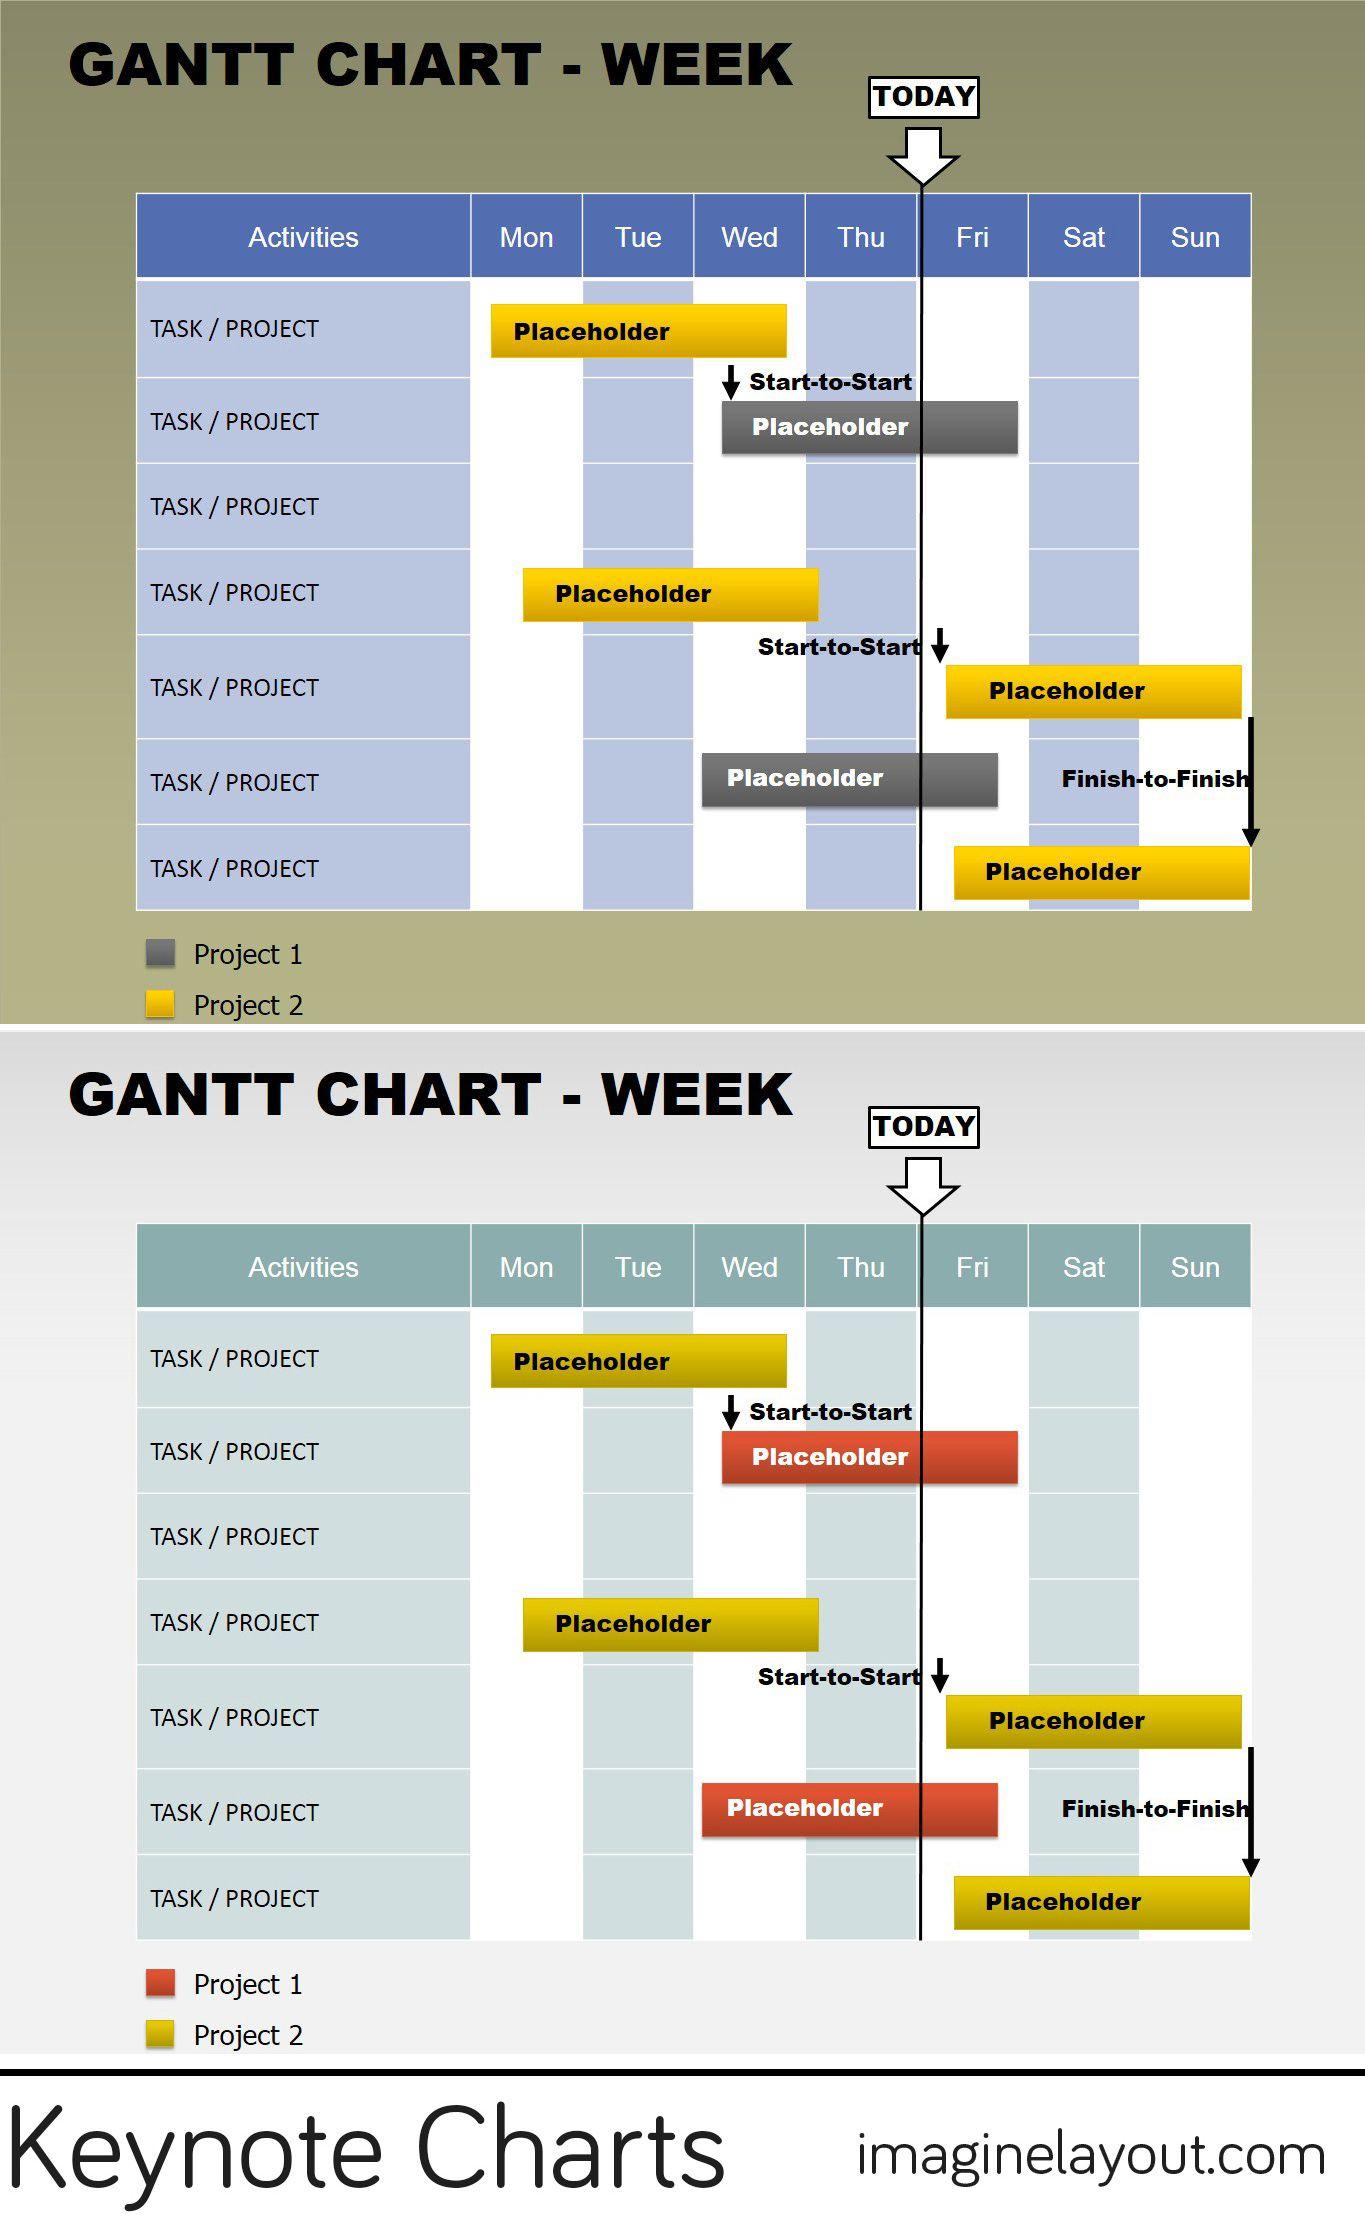 download free gantt week keynote charts template for free presentation free keynote charts. Black Bedroom Furniture Sets. Home Design Ideas